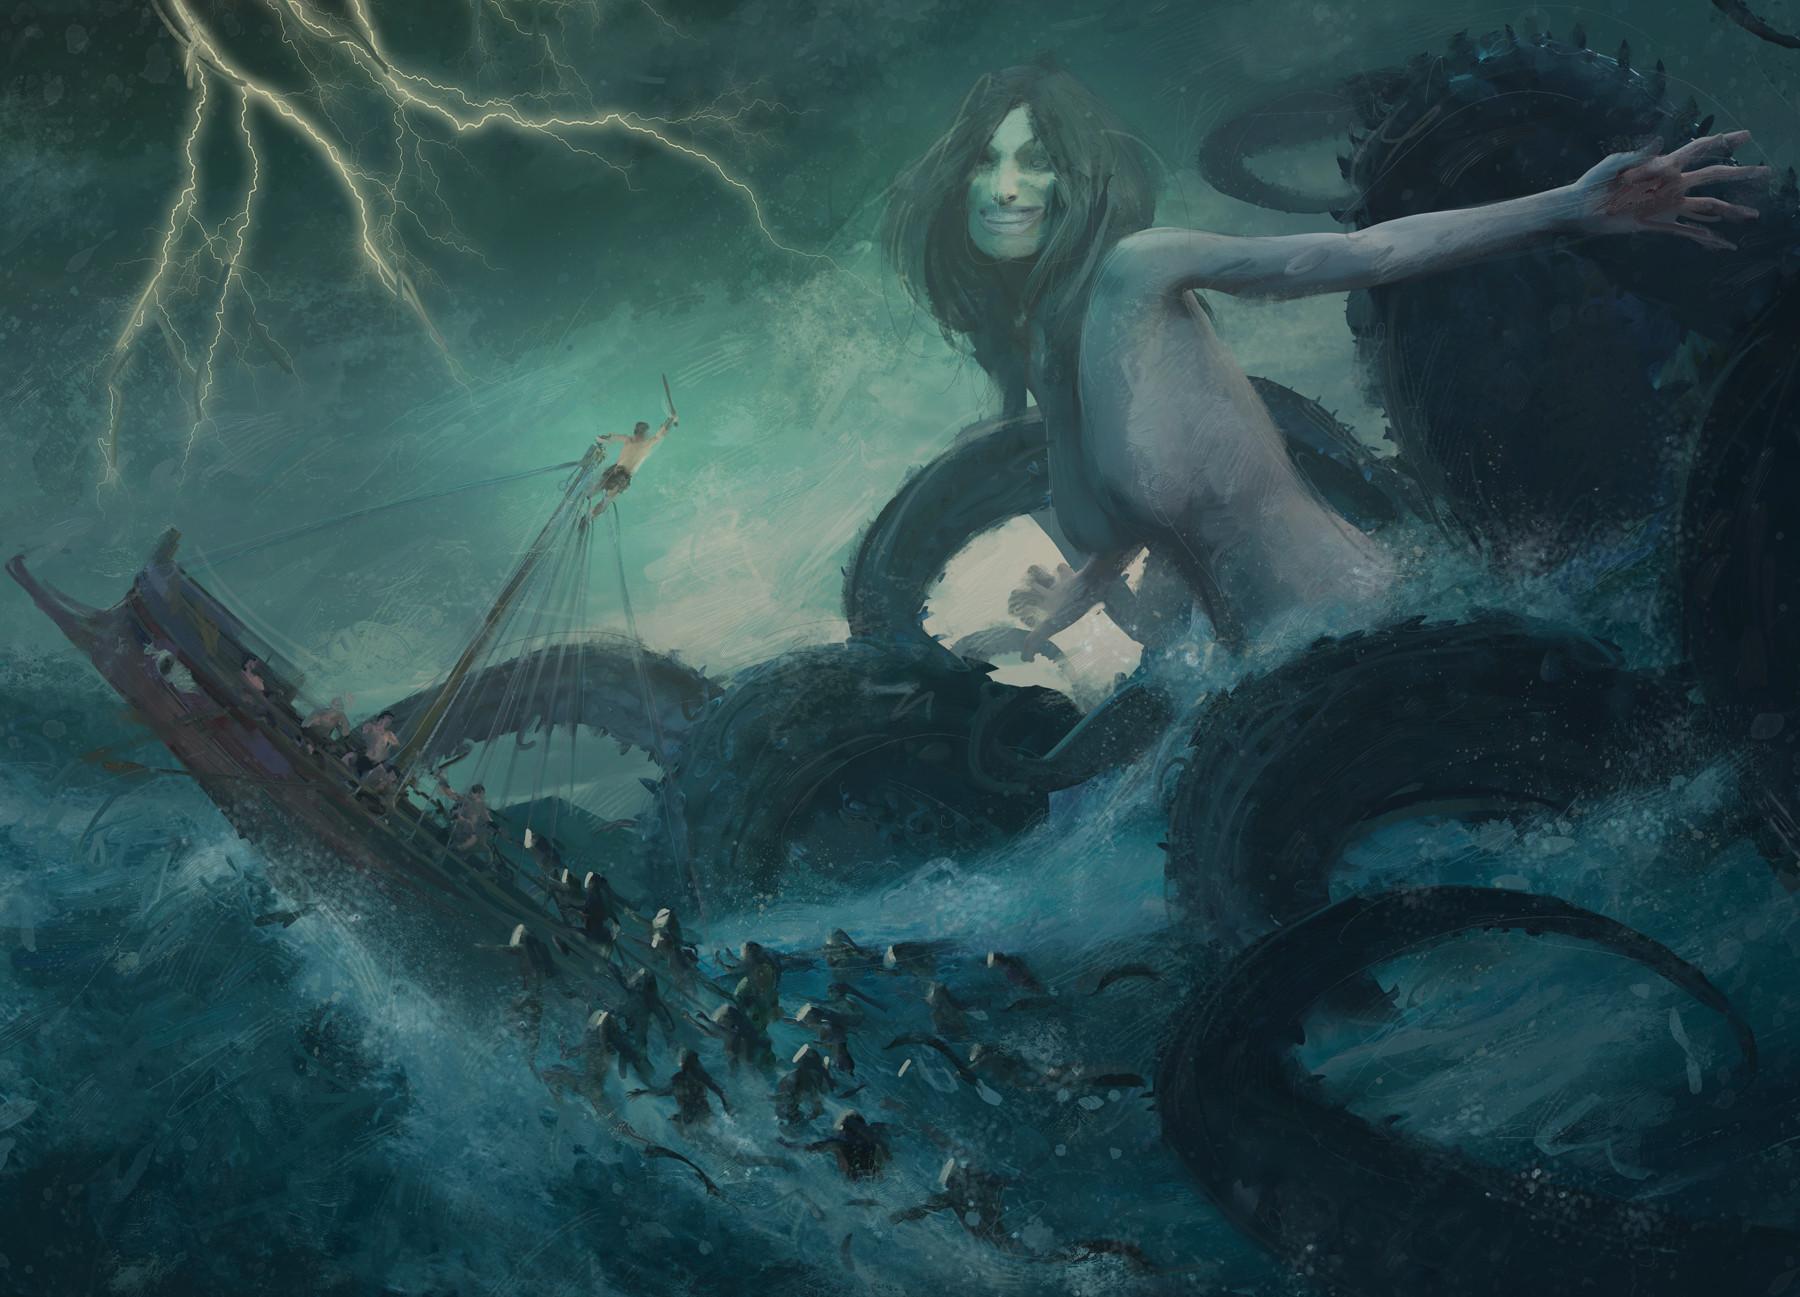 Guillem h pongiluppi board cover mythic battles poseidon concept1